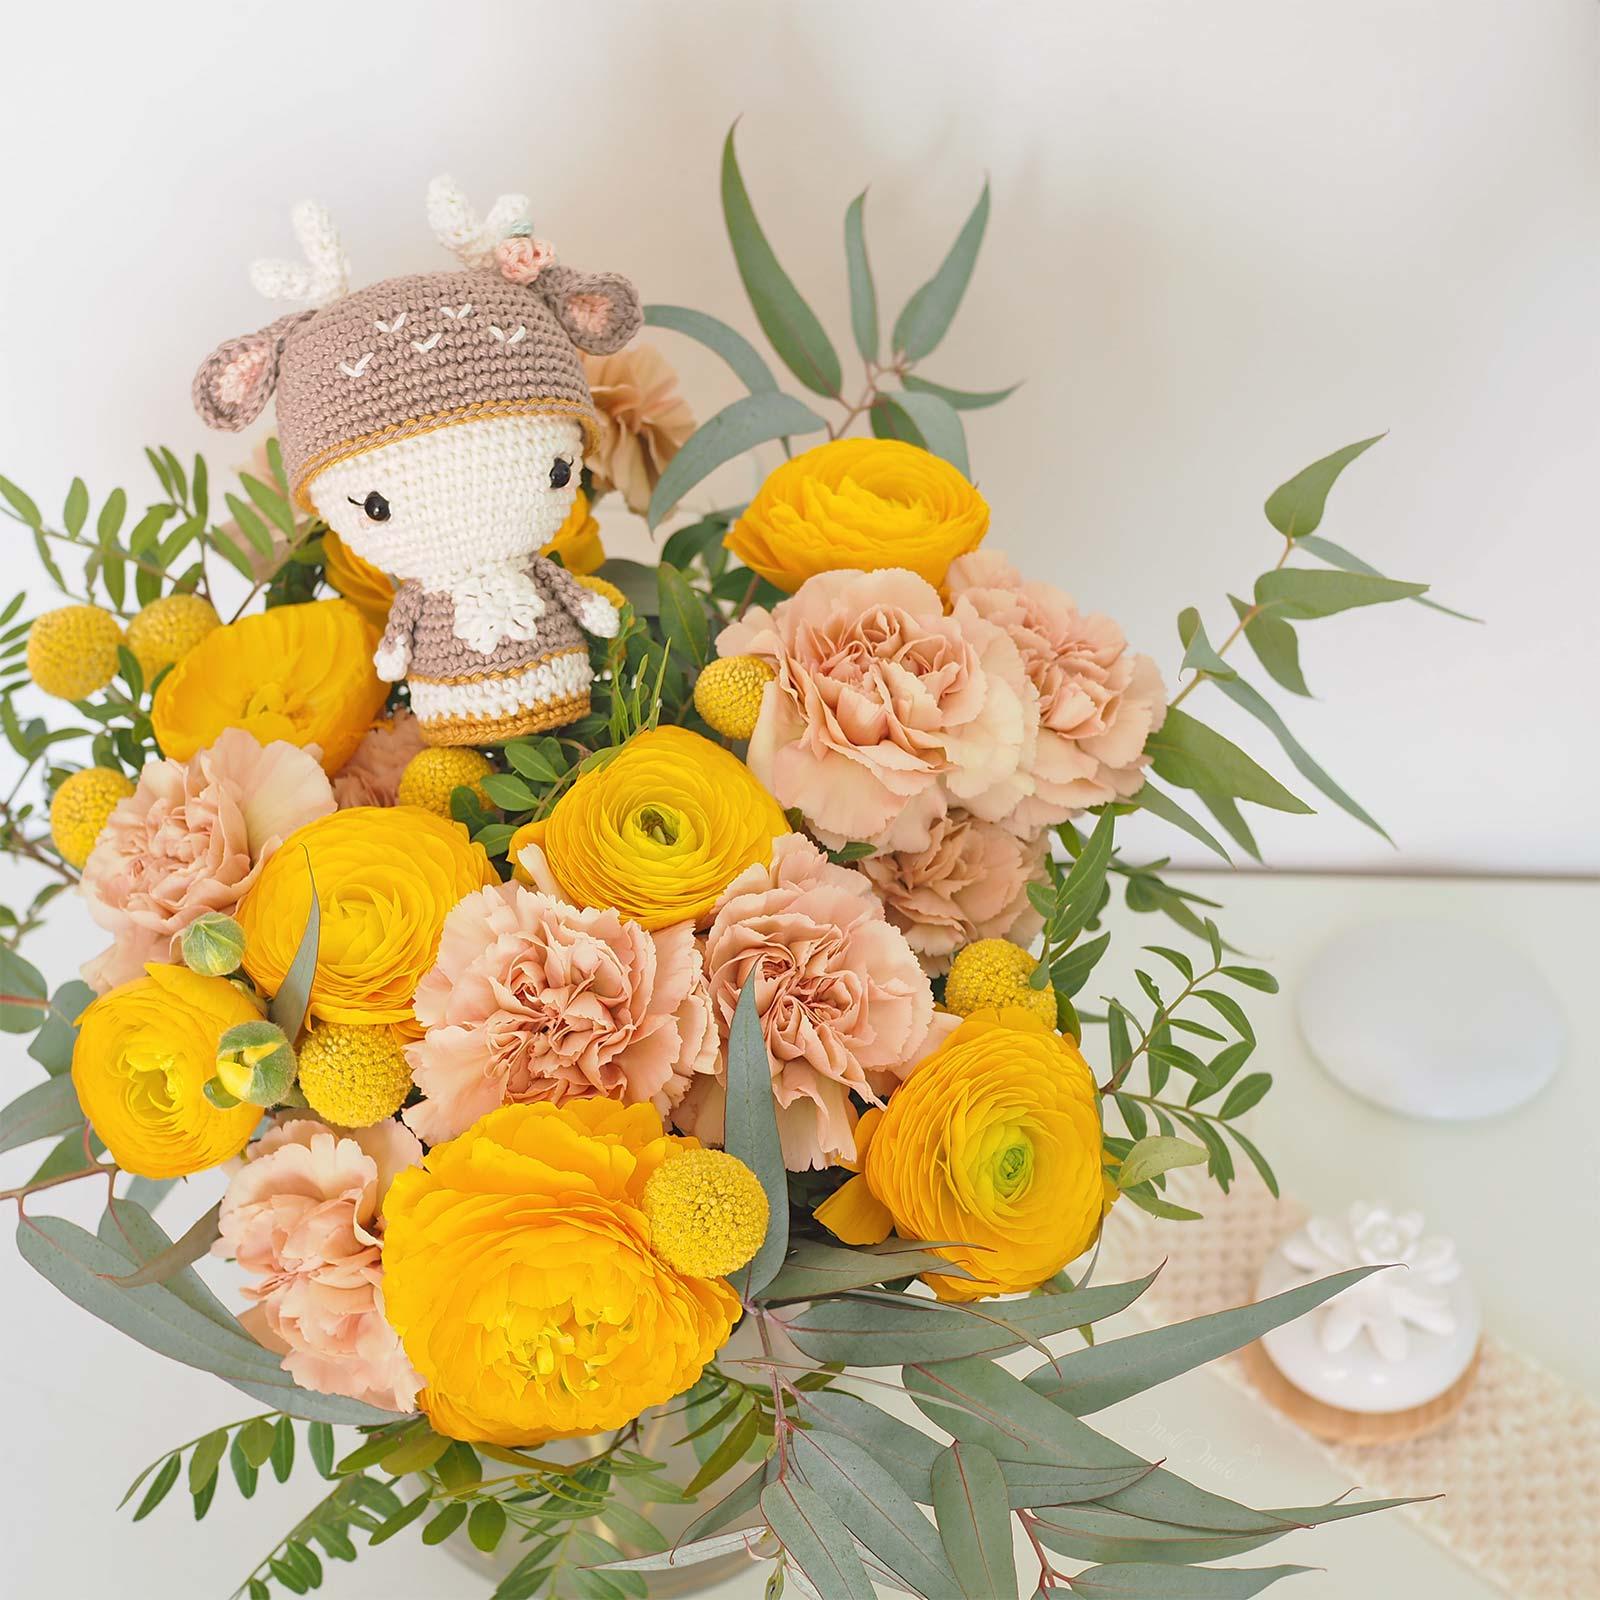 ramo flores Colvin mini annie deer crochet aradiyatoys amialong amigurumipatterns laboutiquedemelimelo